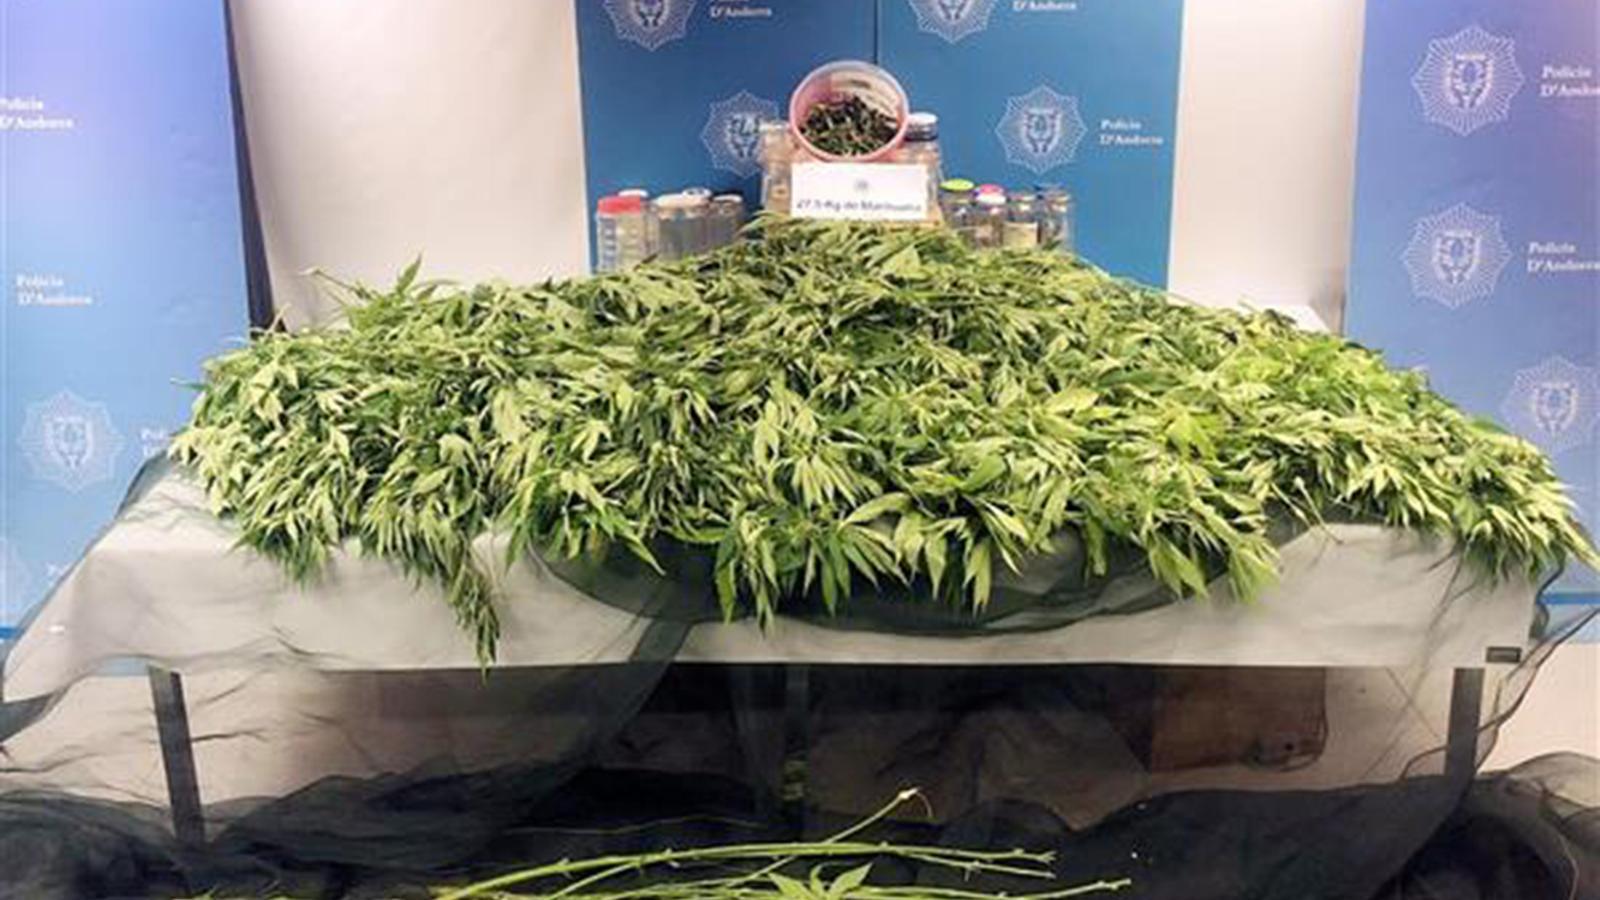 Les plantes decomissades. / COS DE POLICIA